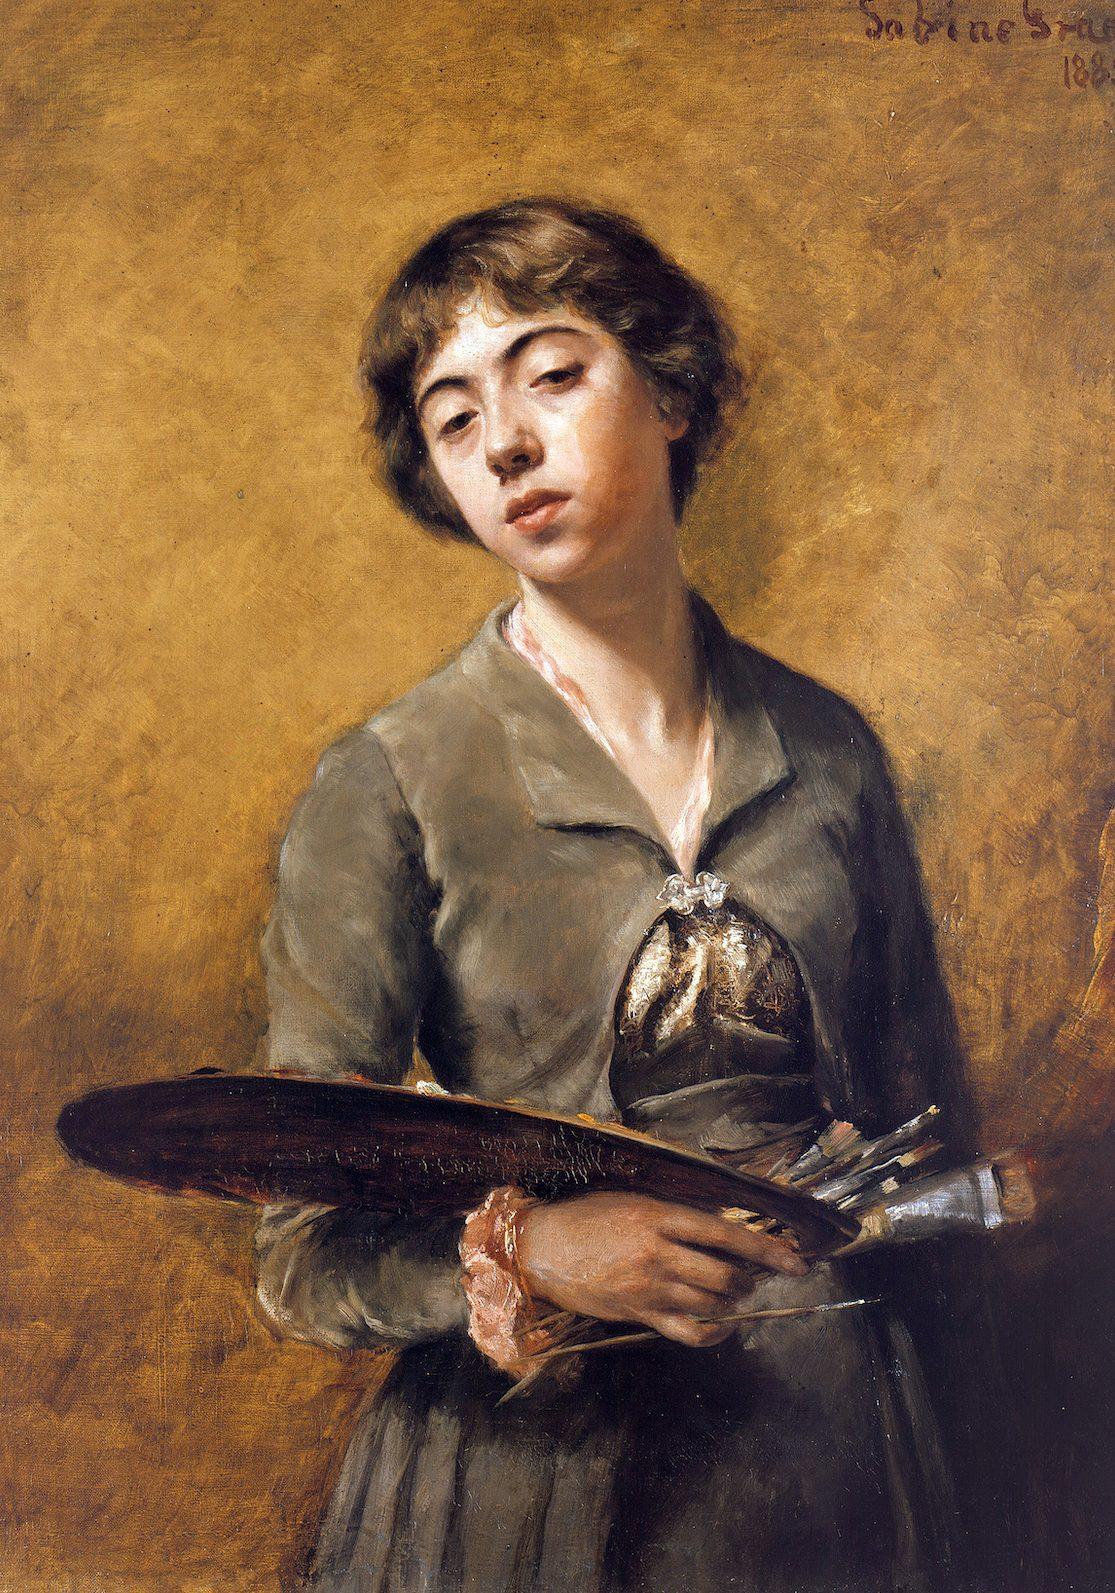 Sabine Lepsius, Selbstbildnis, 1885 © Staatliche Museen zu Berlin, Nationalgalerie / Jörg P. Anders